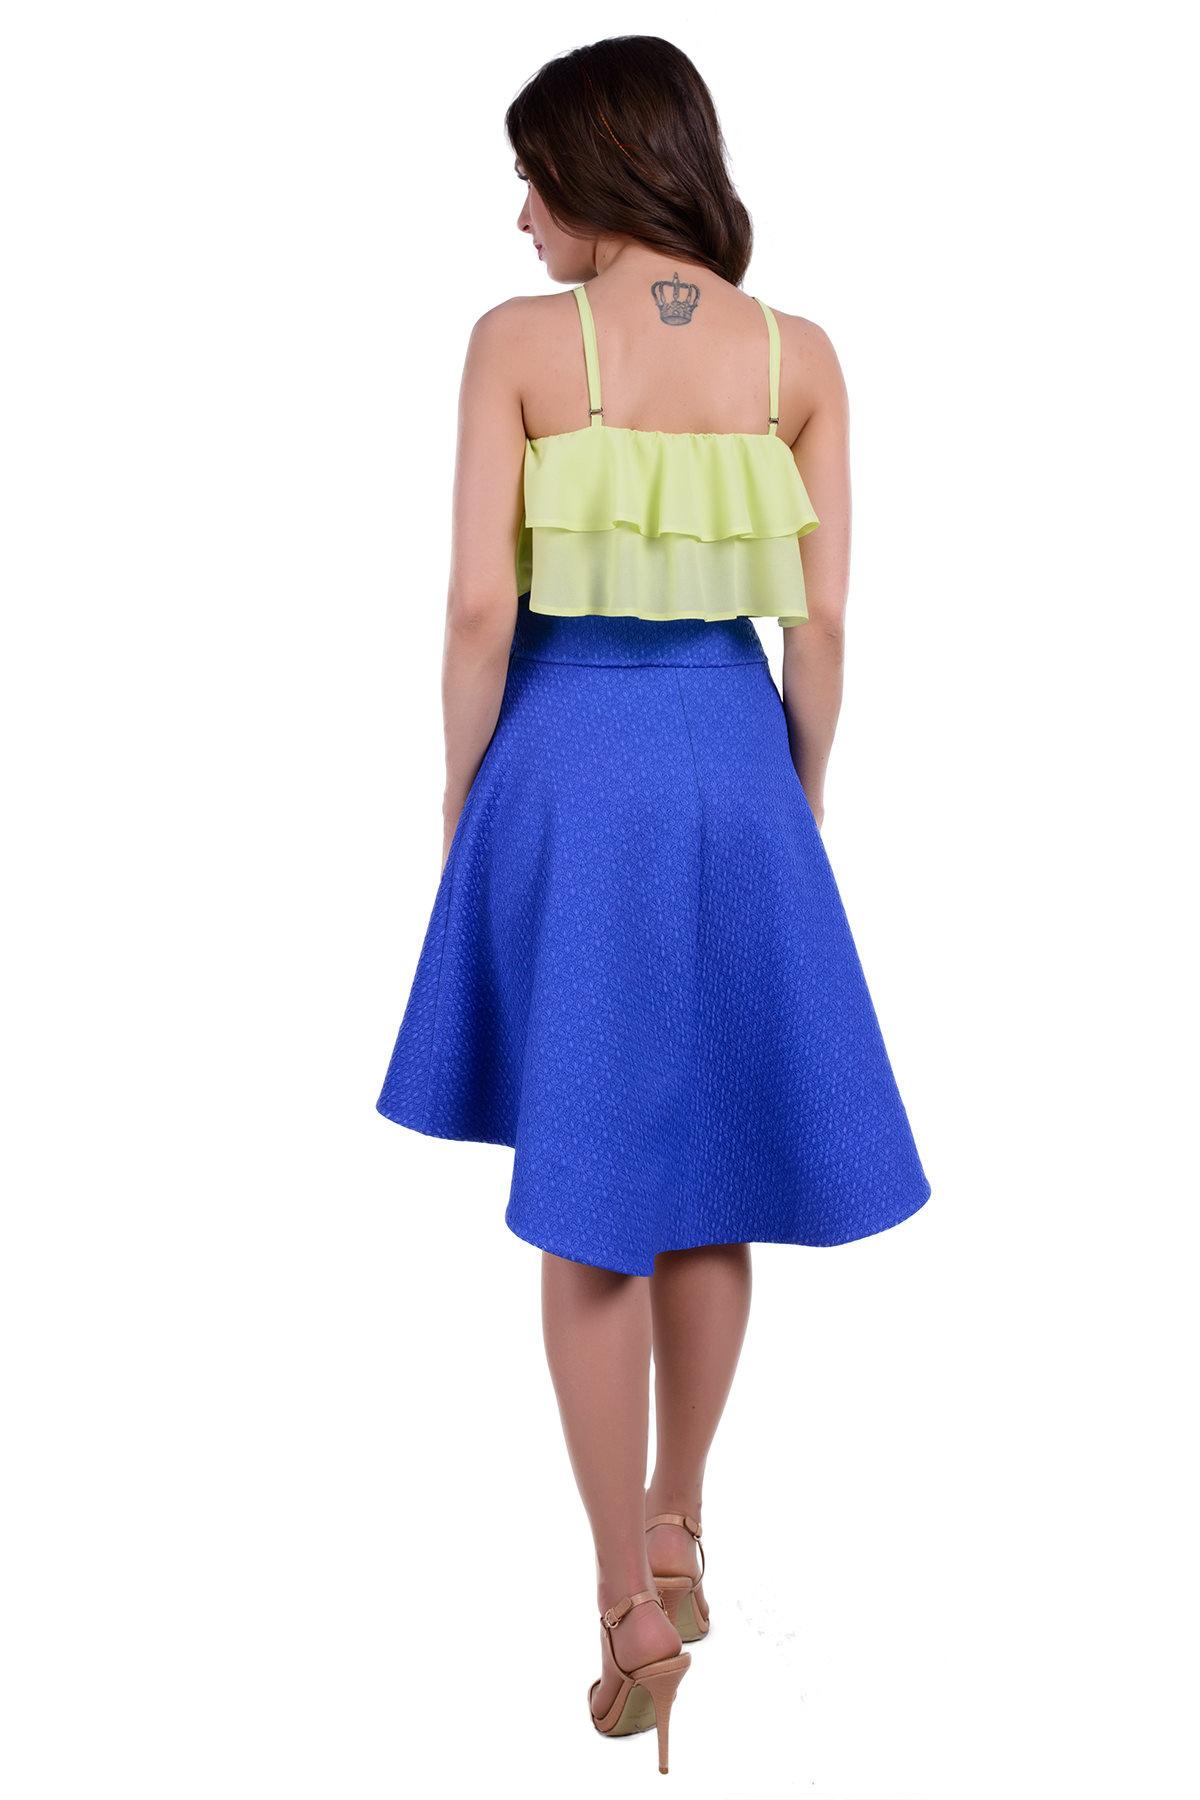 Платье Рио 285 Цвет: Лайм / электрик